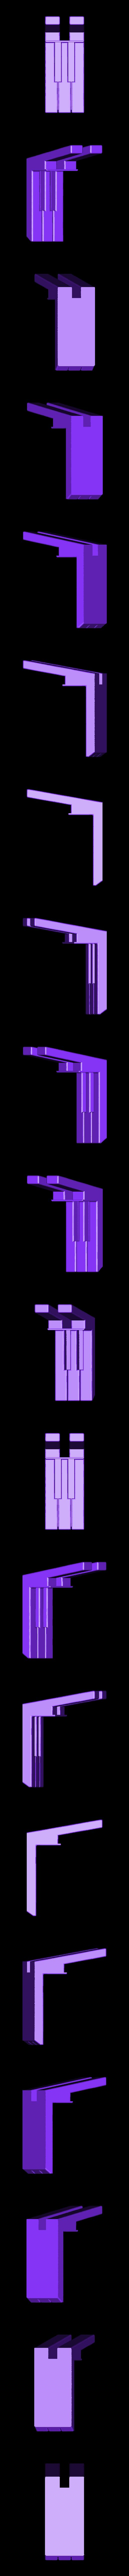 WhiteKeys.stl Download free STL file Piano Keys Mobile Dock • 3D printer object, Double_Alfa_3D